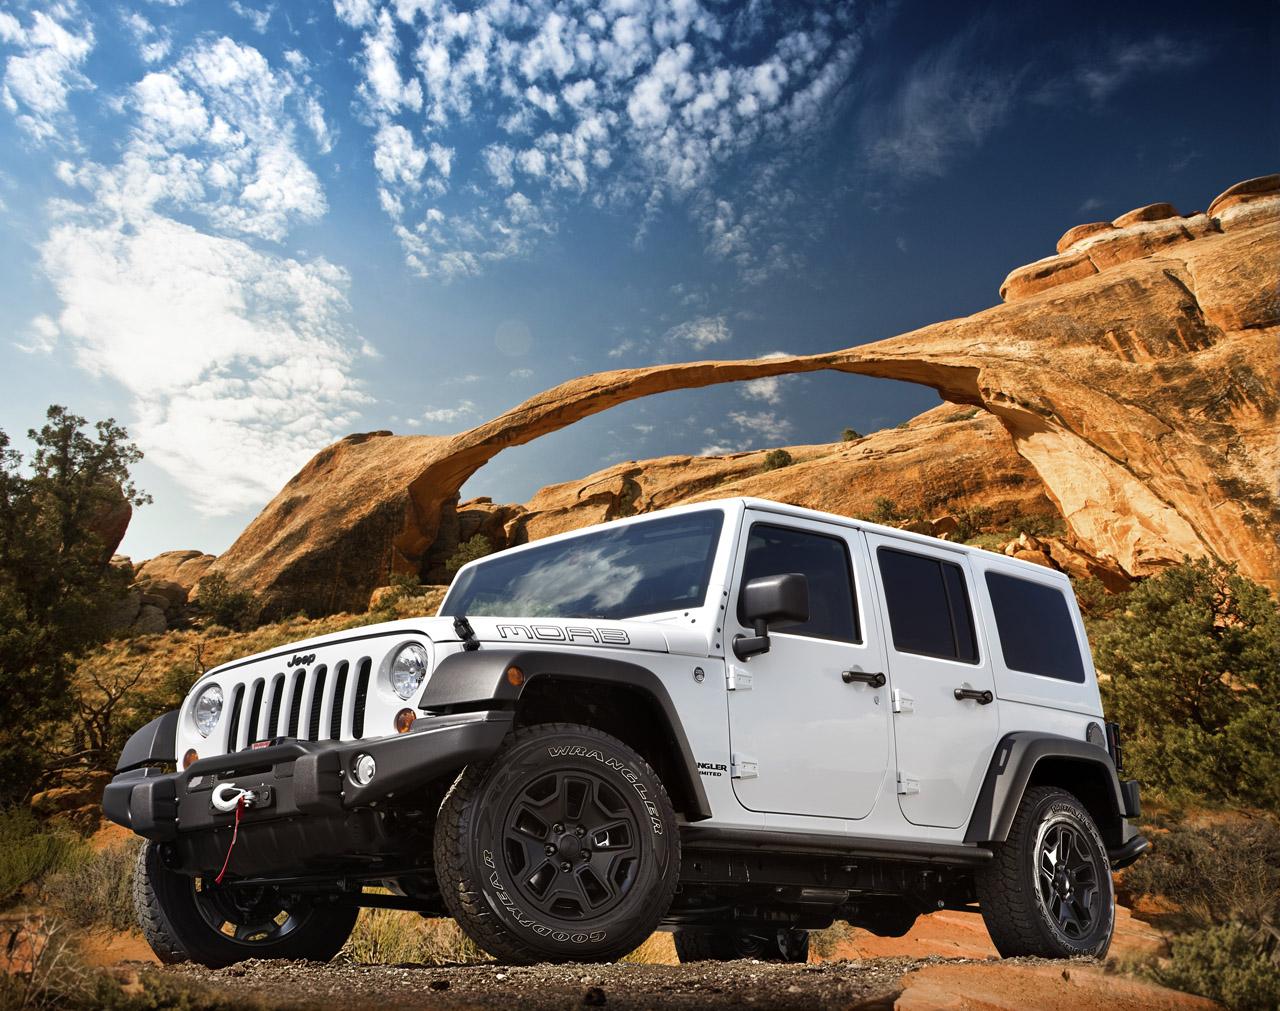 2012 Jeep Wrangler Freedom Edition Jeep Wrangler Moab Special Edition Unveiled - autoevolution